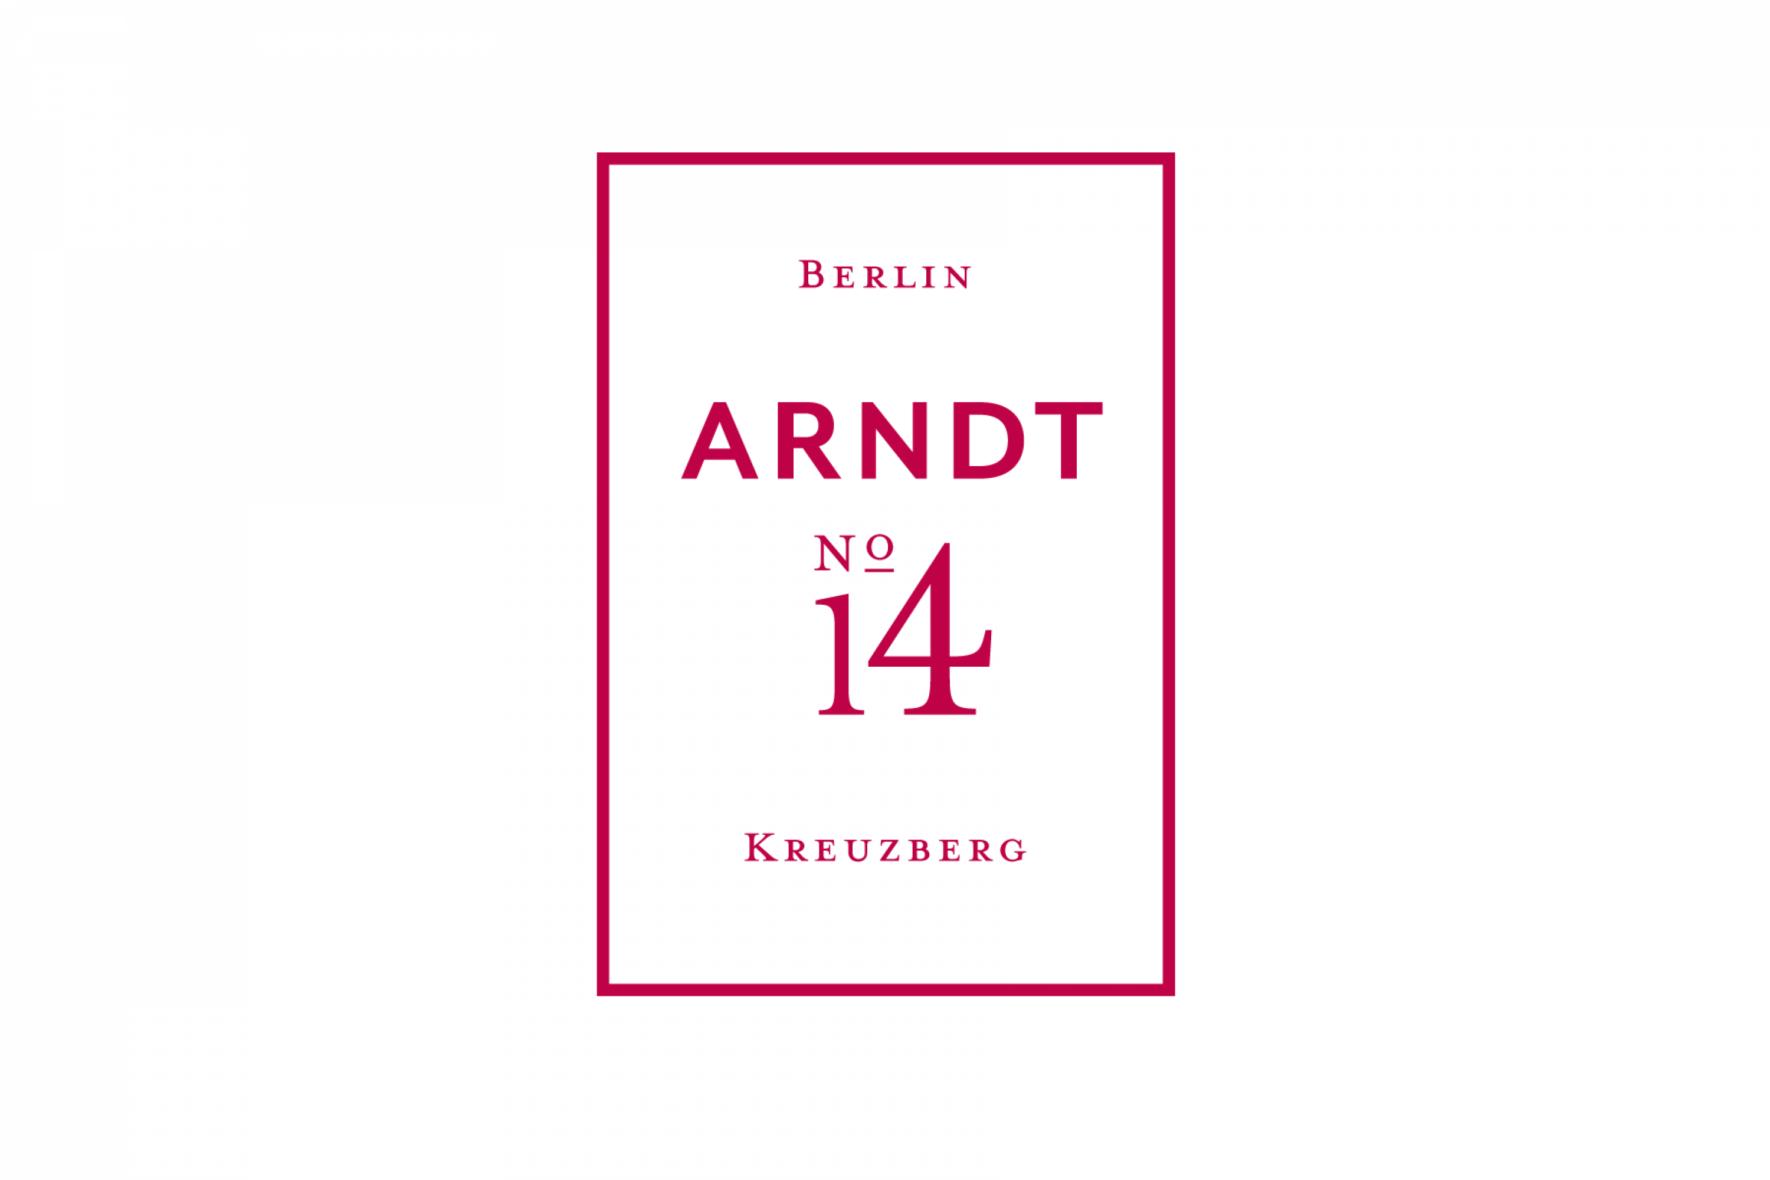 Vorschau-Bild: Immobilienbranding: Arndt No. 14 – Berlin, Kreuzberg